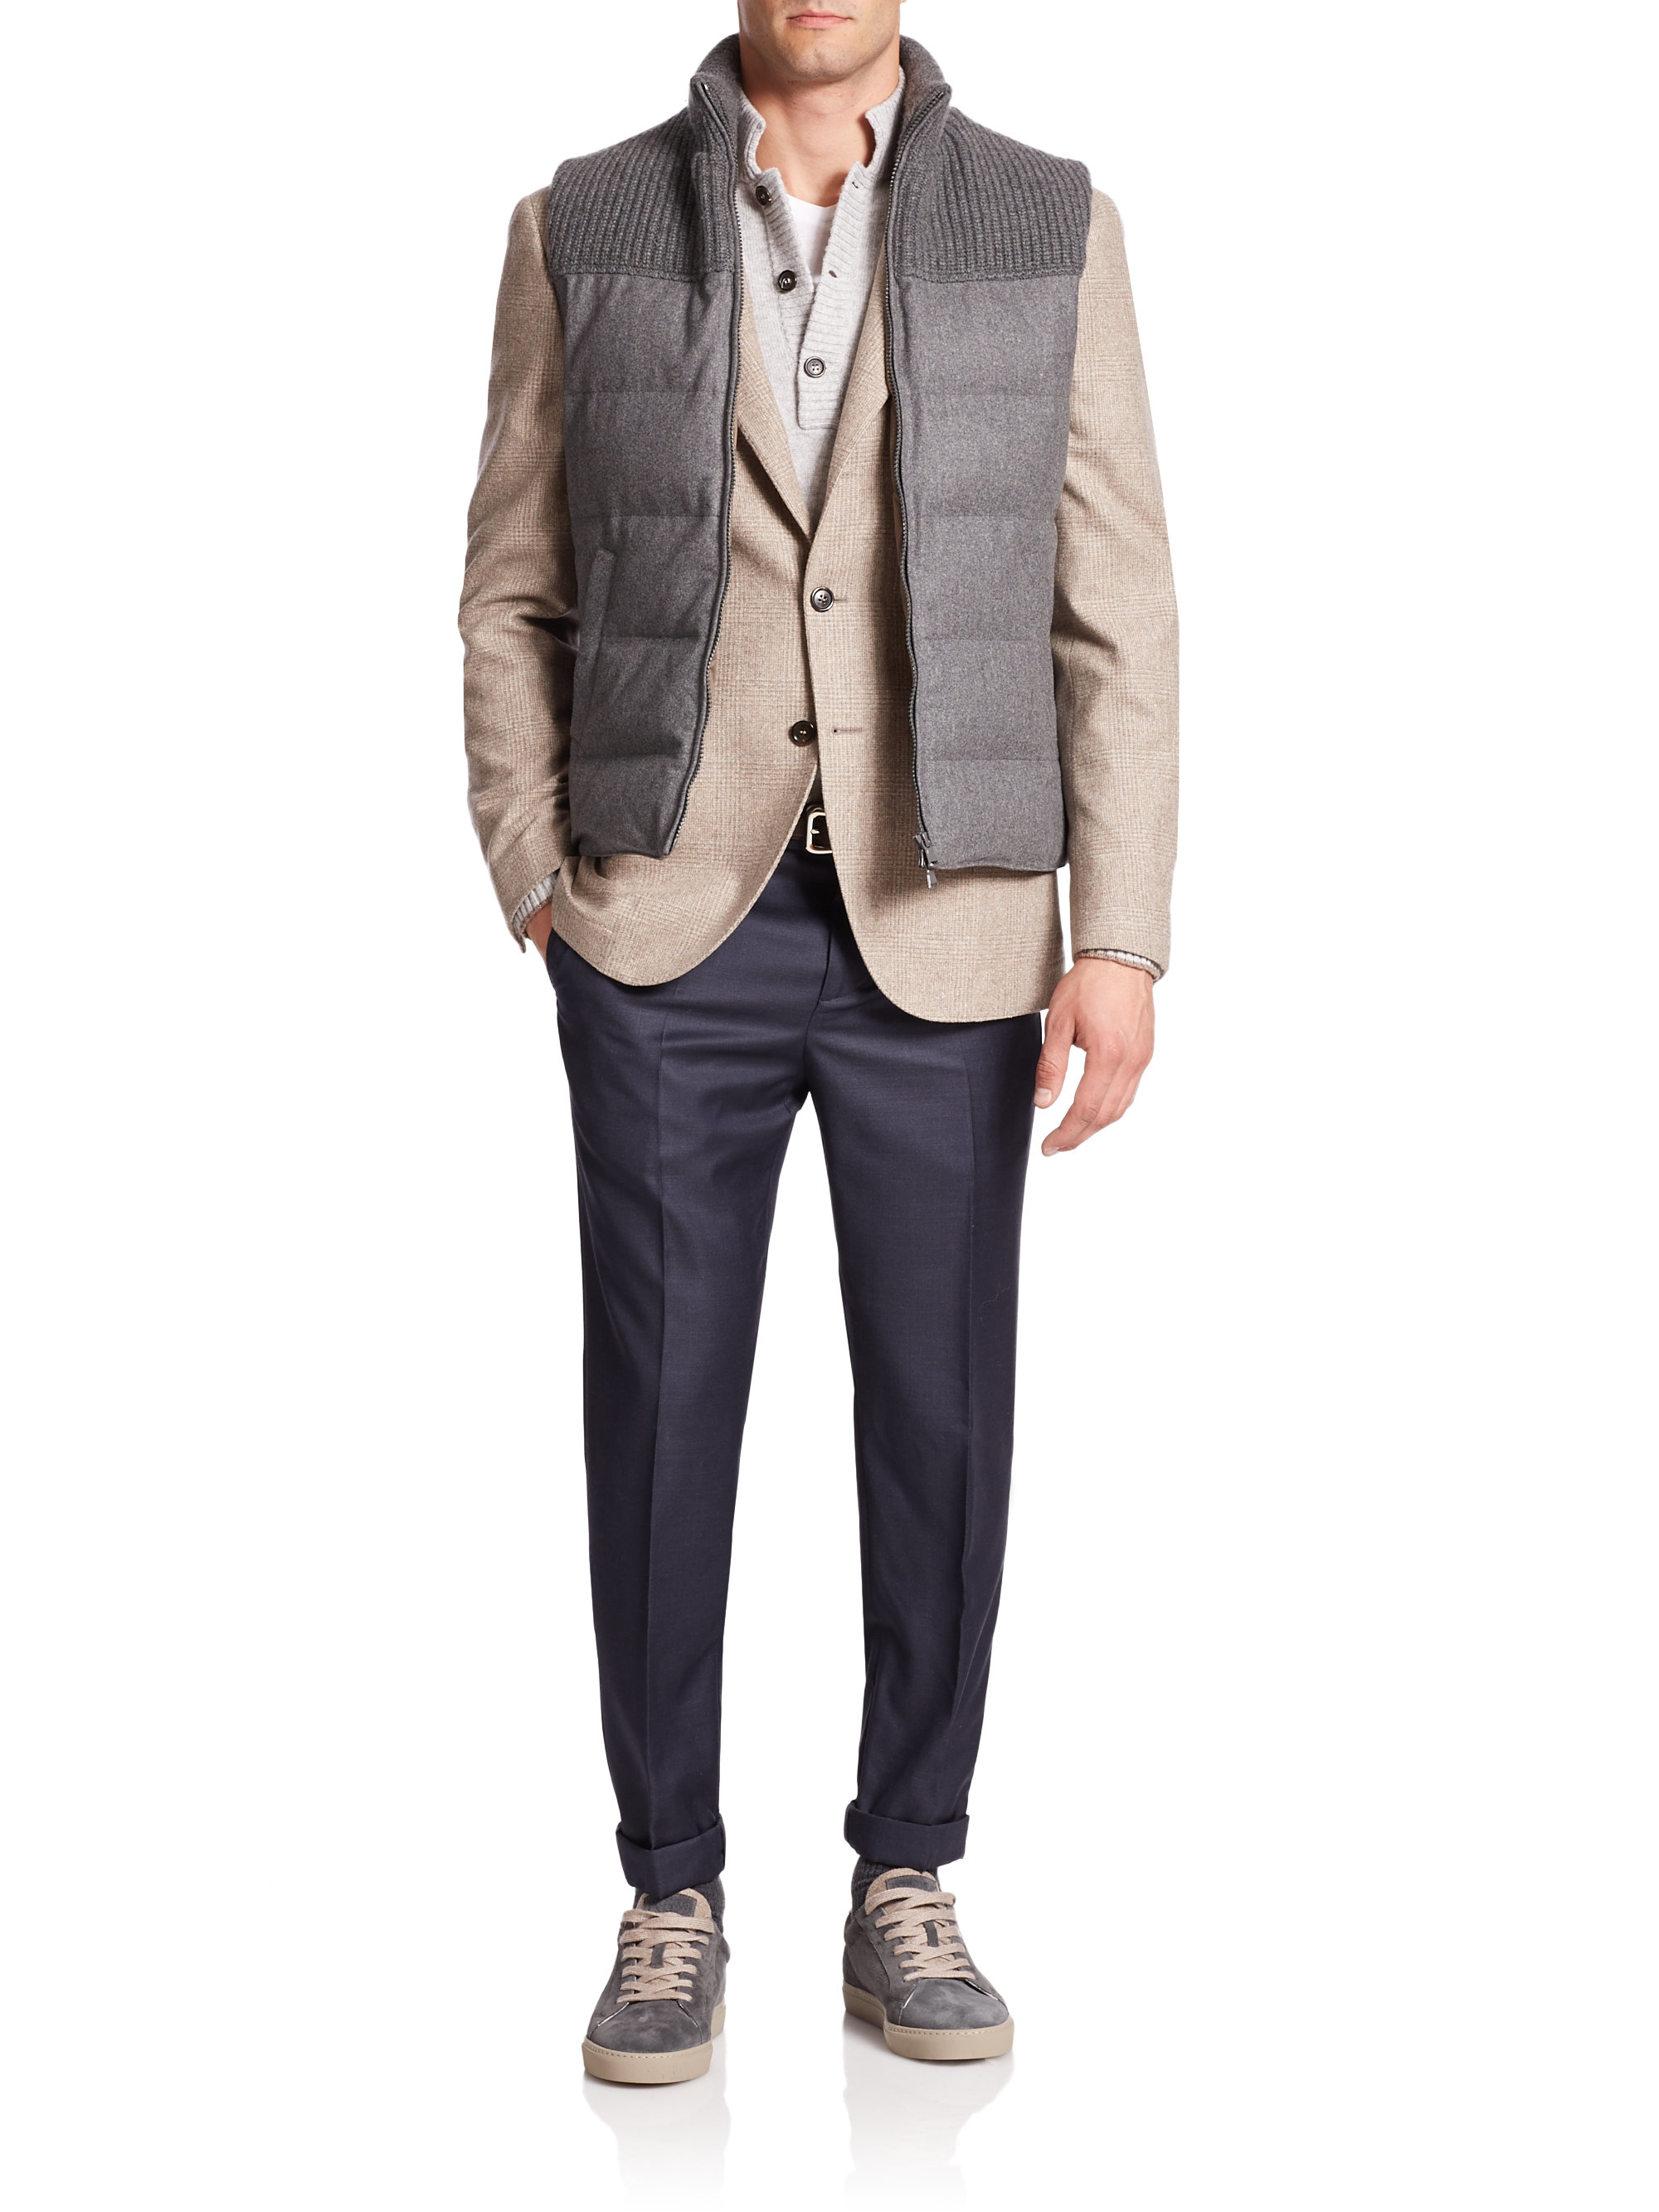 Lyst Brunello Cucinelli Flannel Puffer Vest In Gray For Men